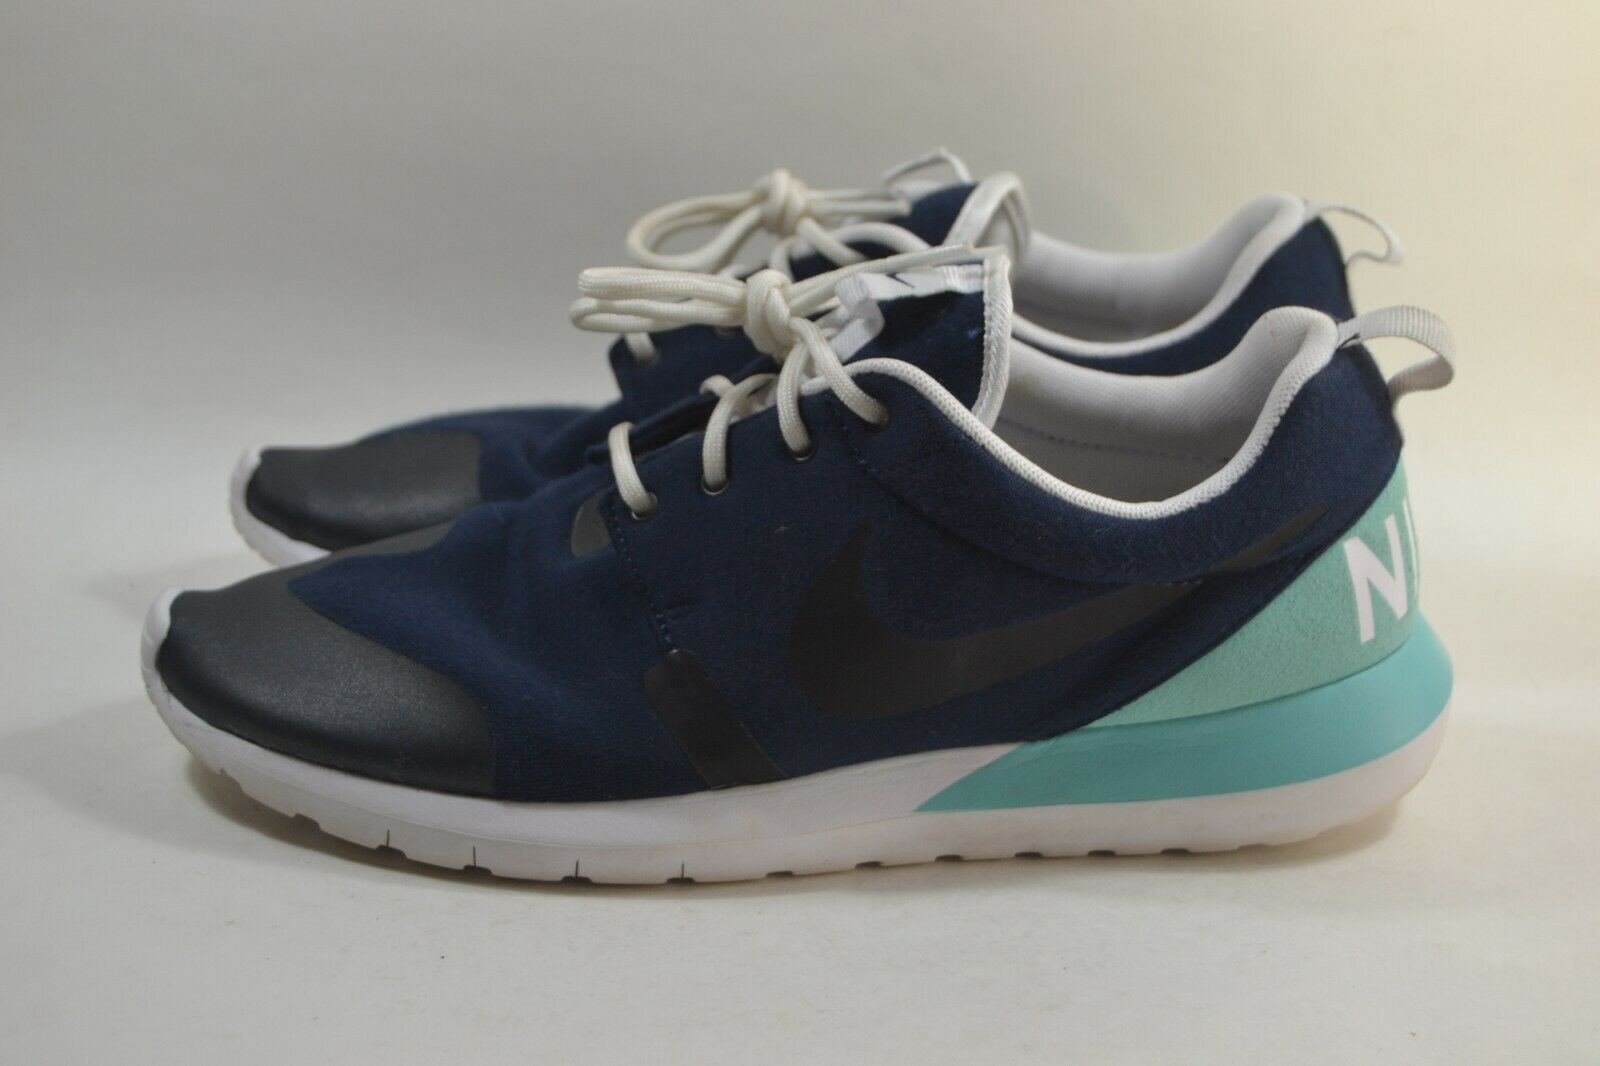 137ca4458bca Pre-owned Womens Nike Nike Nike Roshe Run Tech Fleece Obsidian 652804-403  64a68f